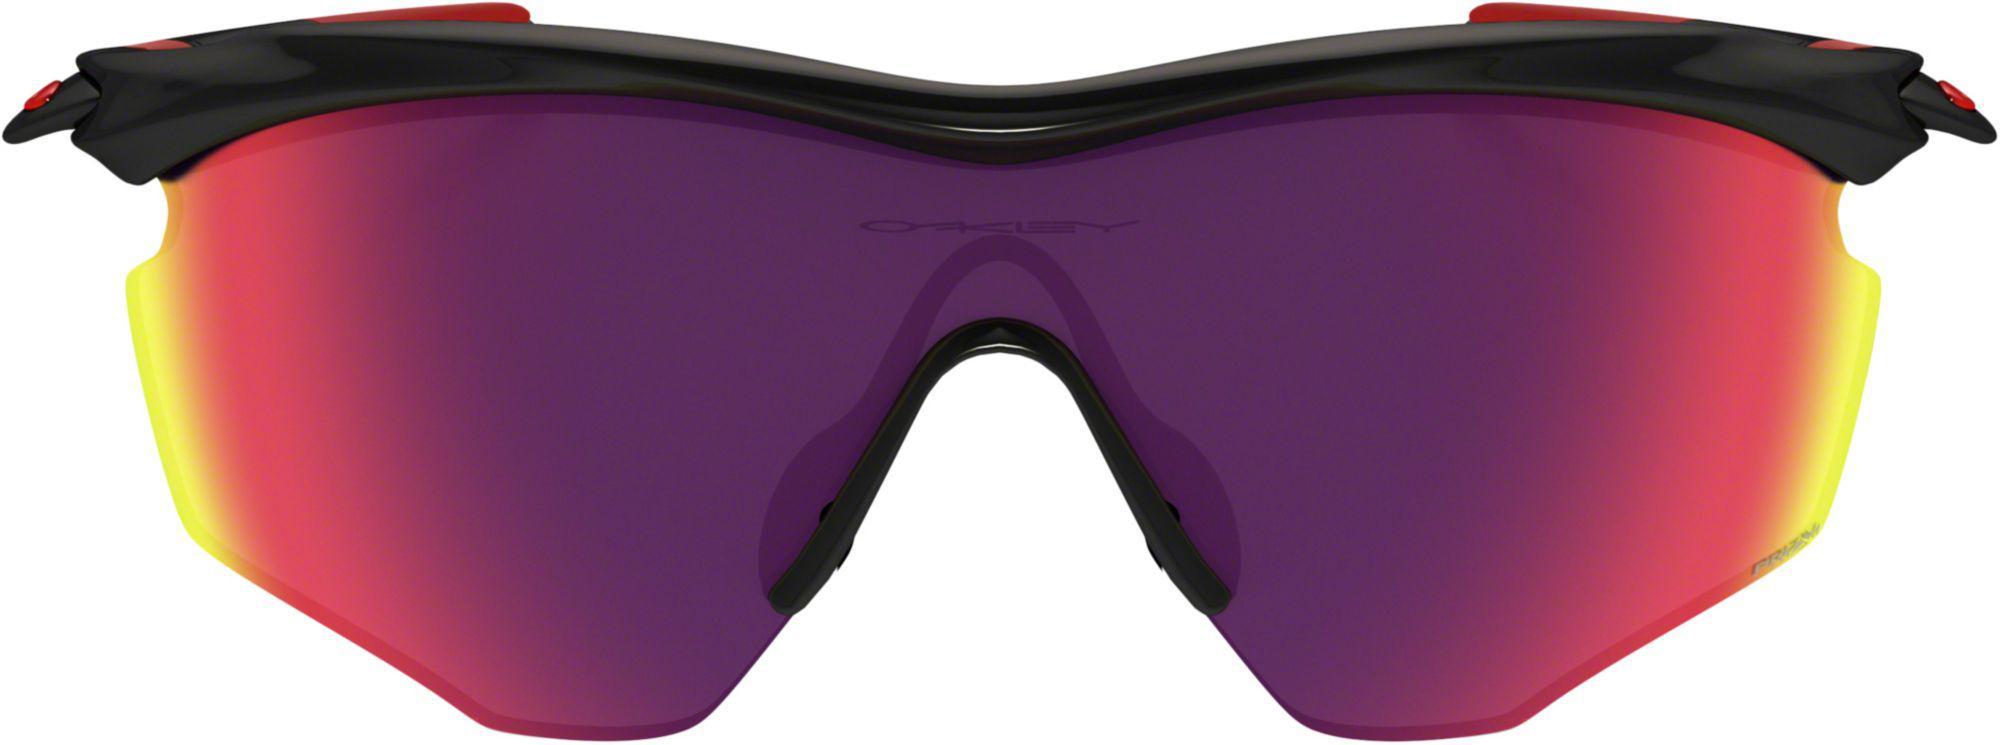 ba4e2891c1 Oakley - Multicolor M2 Frame Xl Prizm Road Sunglasses - Lyst. View  fullscreen